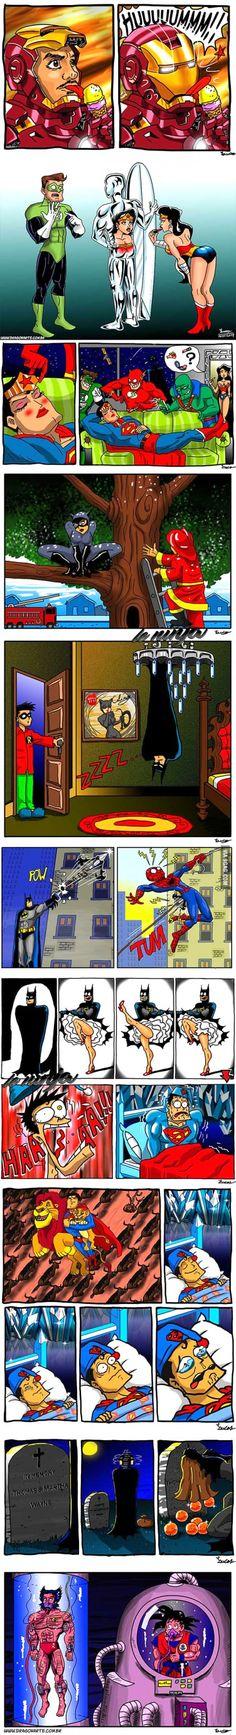 Super Heroes fun time - 9GAG